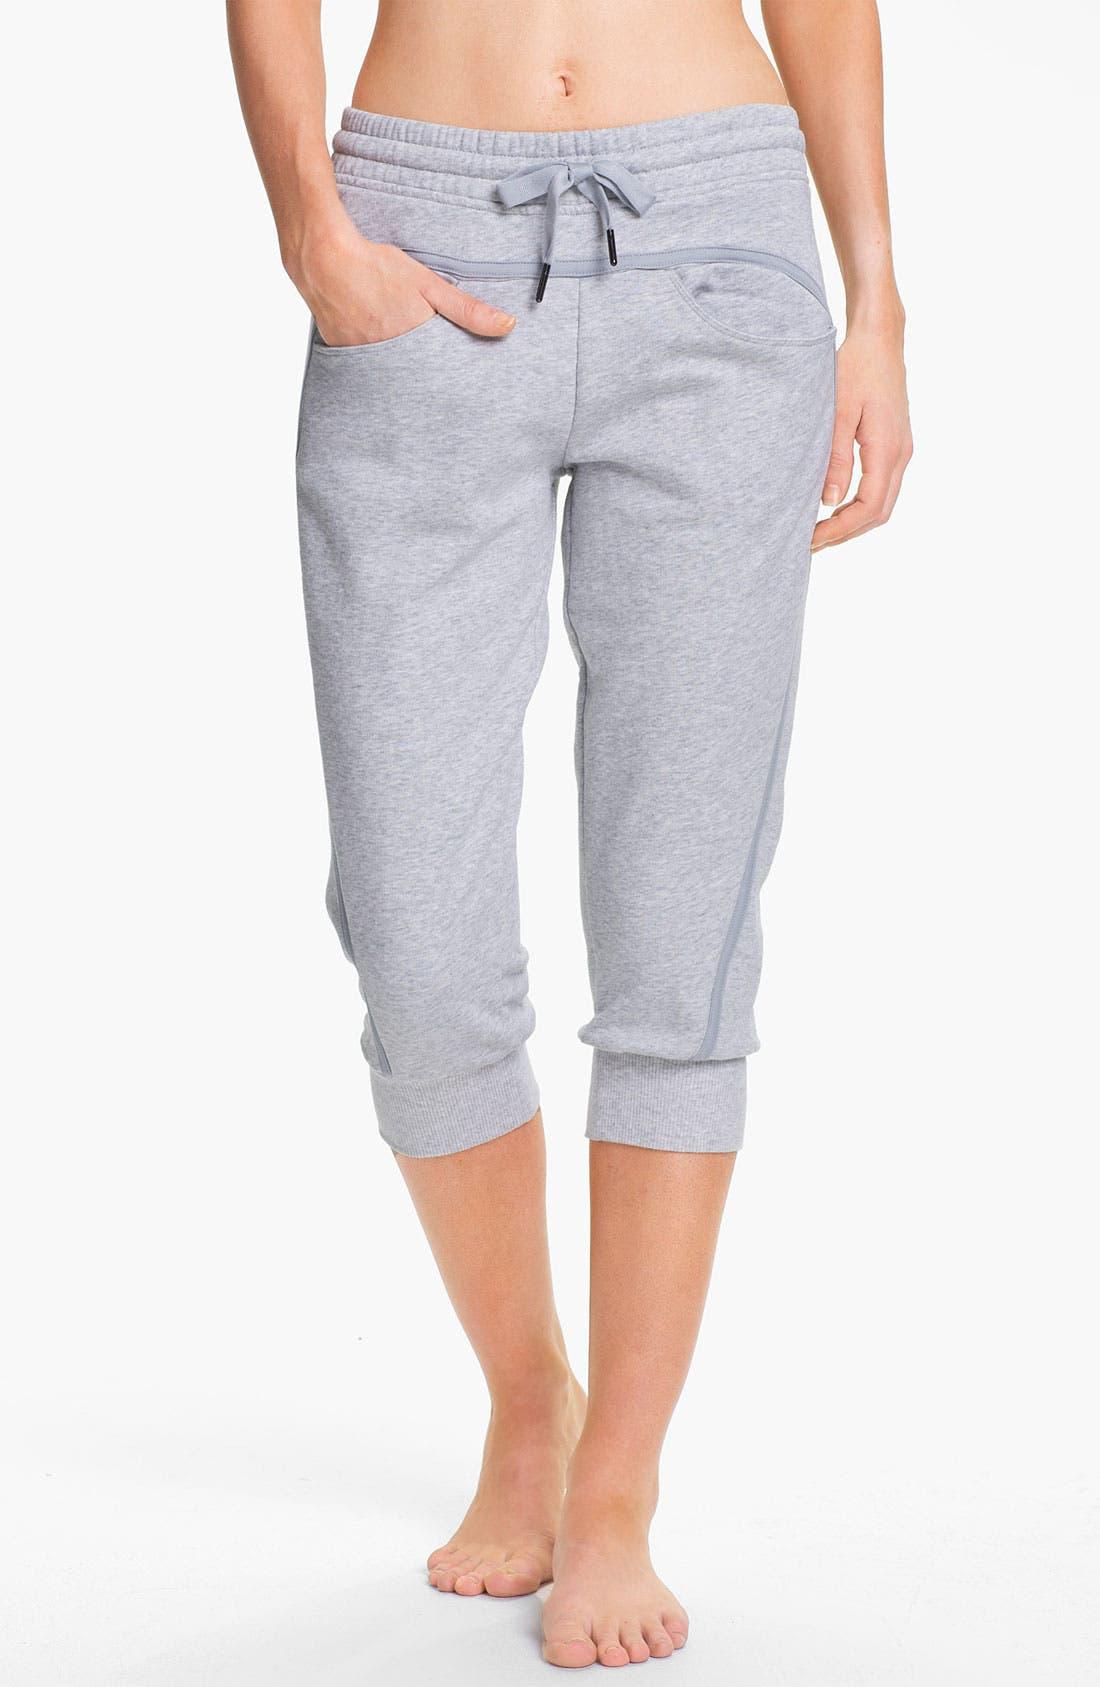 Main Image - adidas by Stella McCartney 'Essentials' Three-Quarter Sweatpants